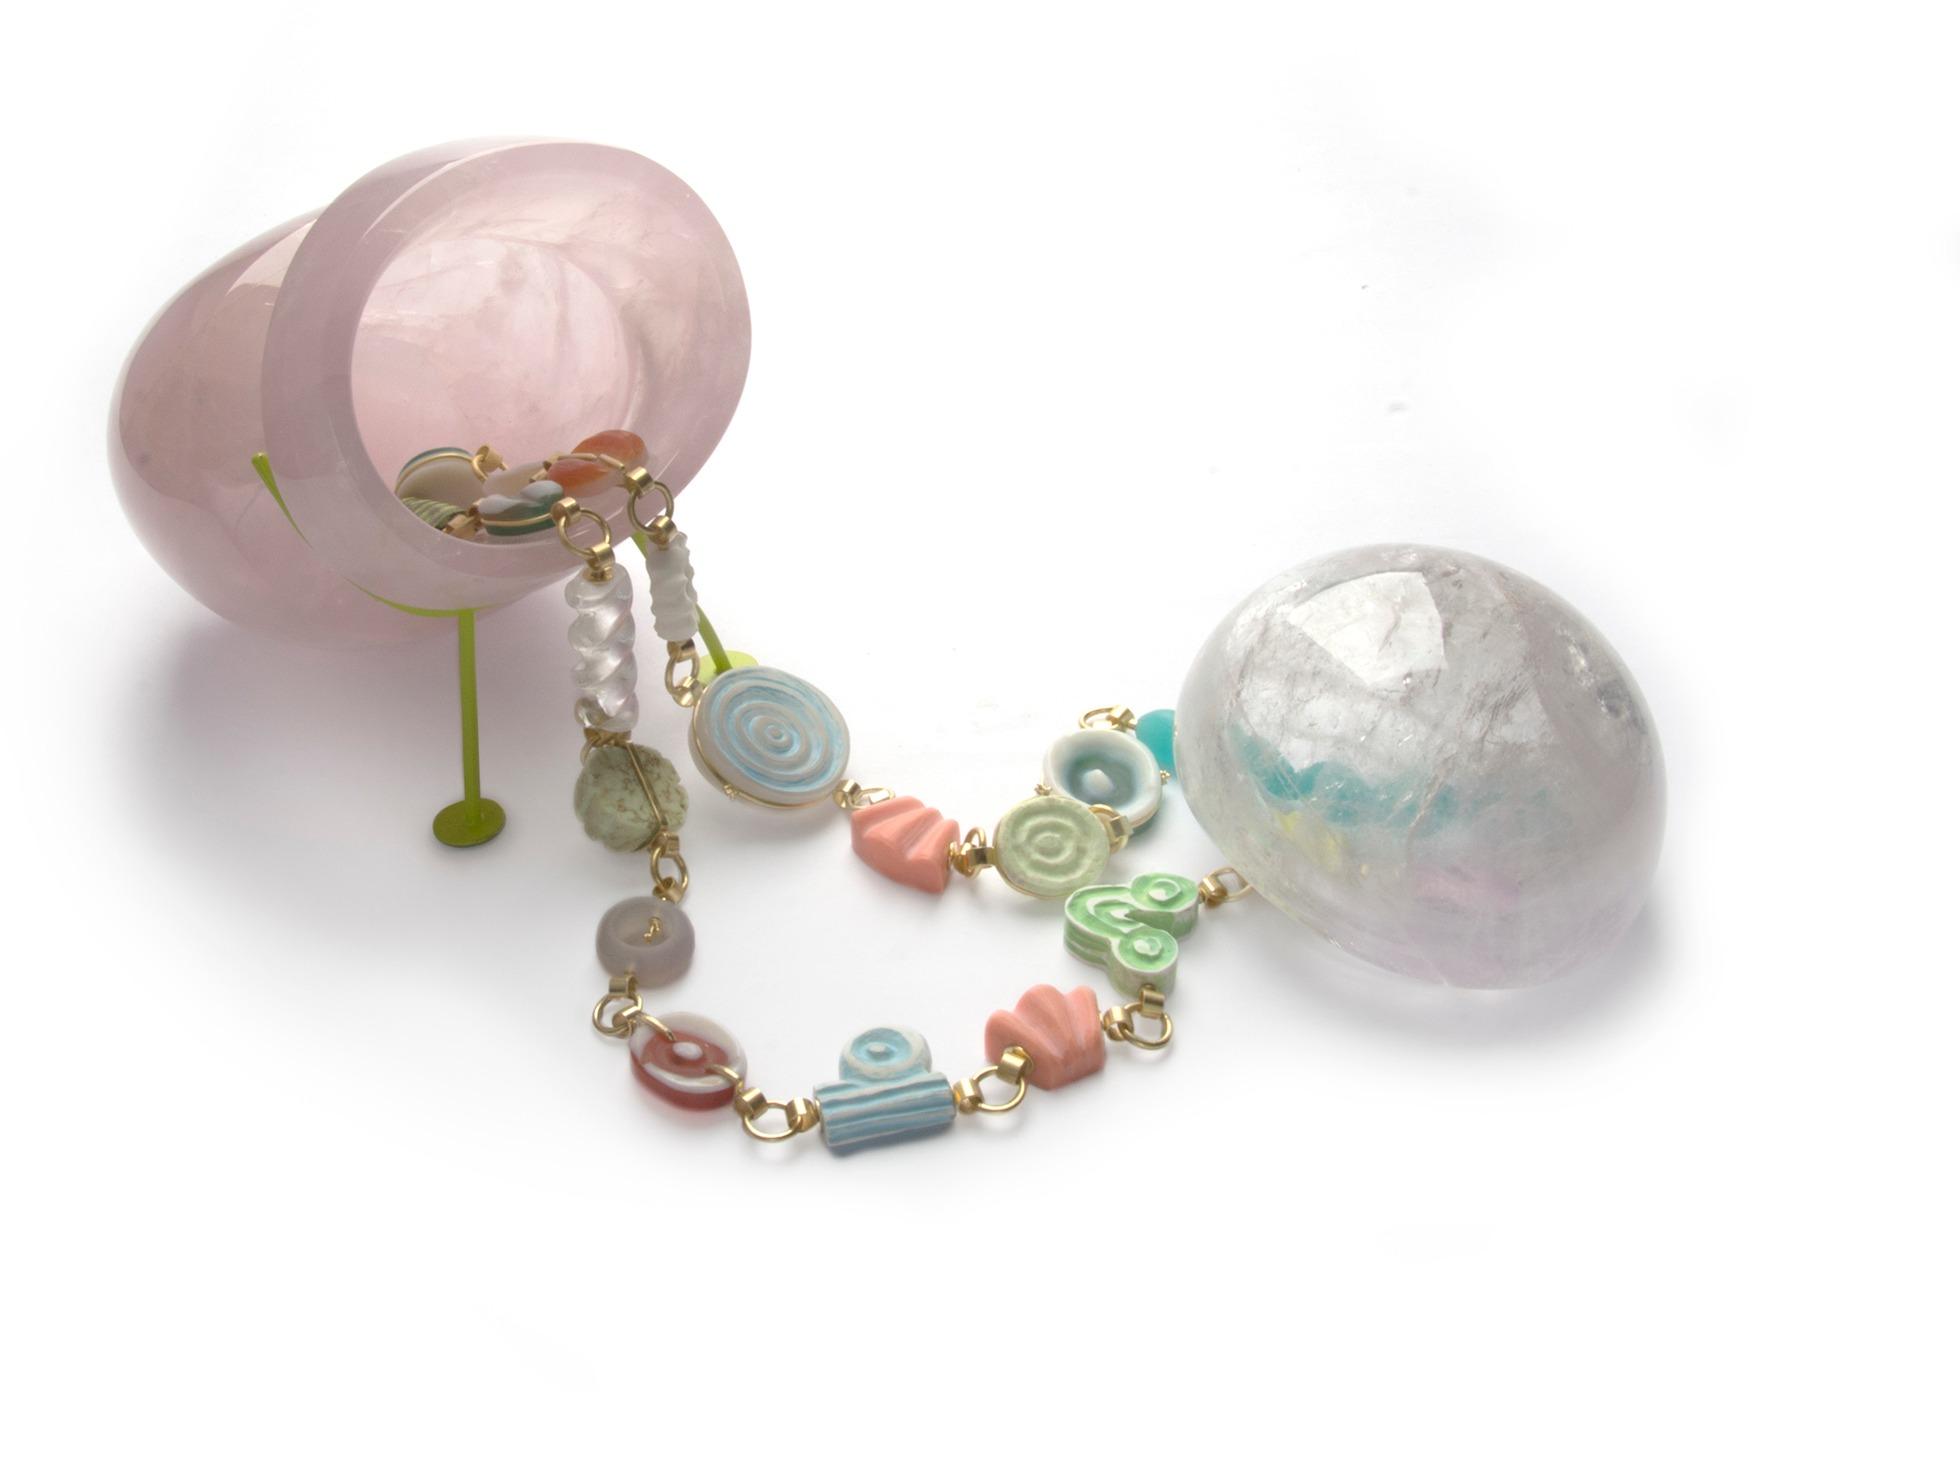 Caramelera & Stone Candies